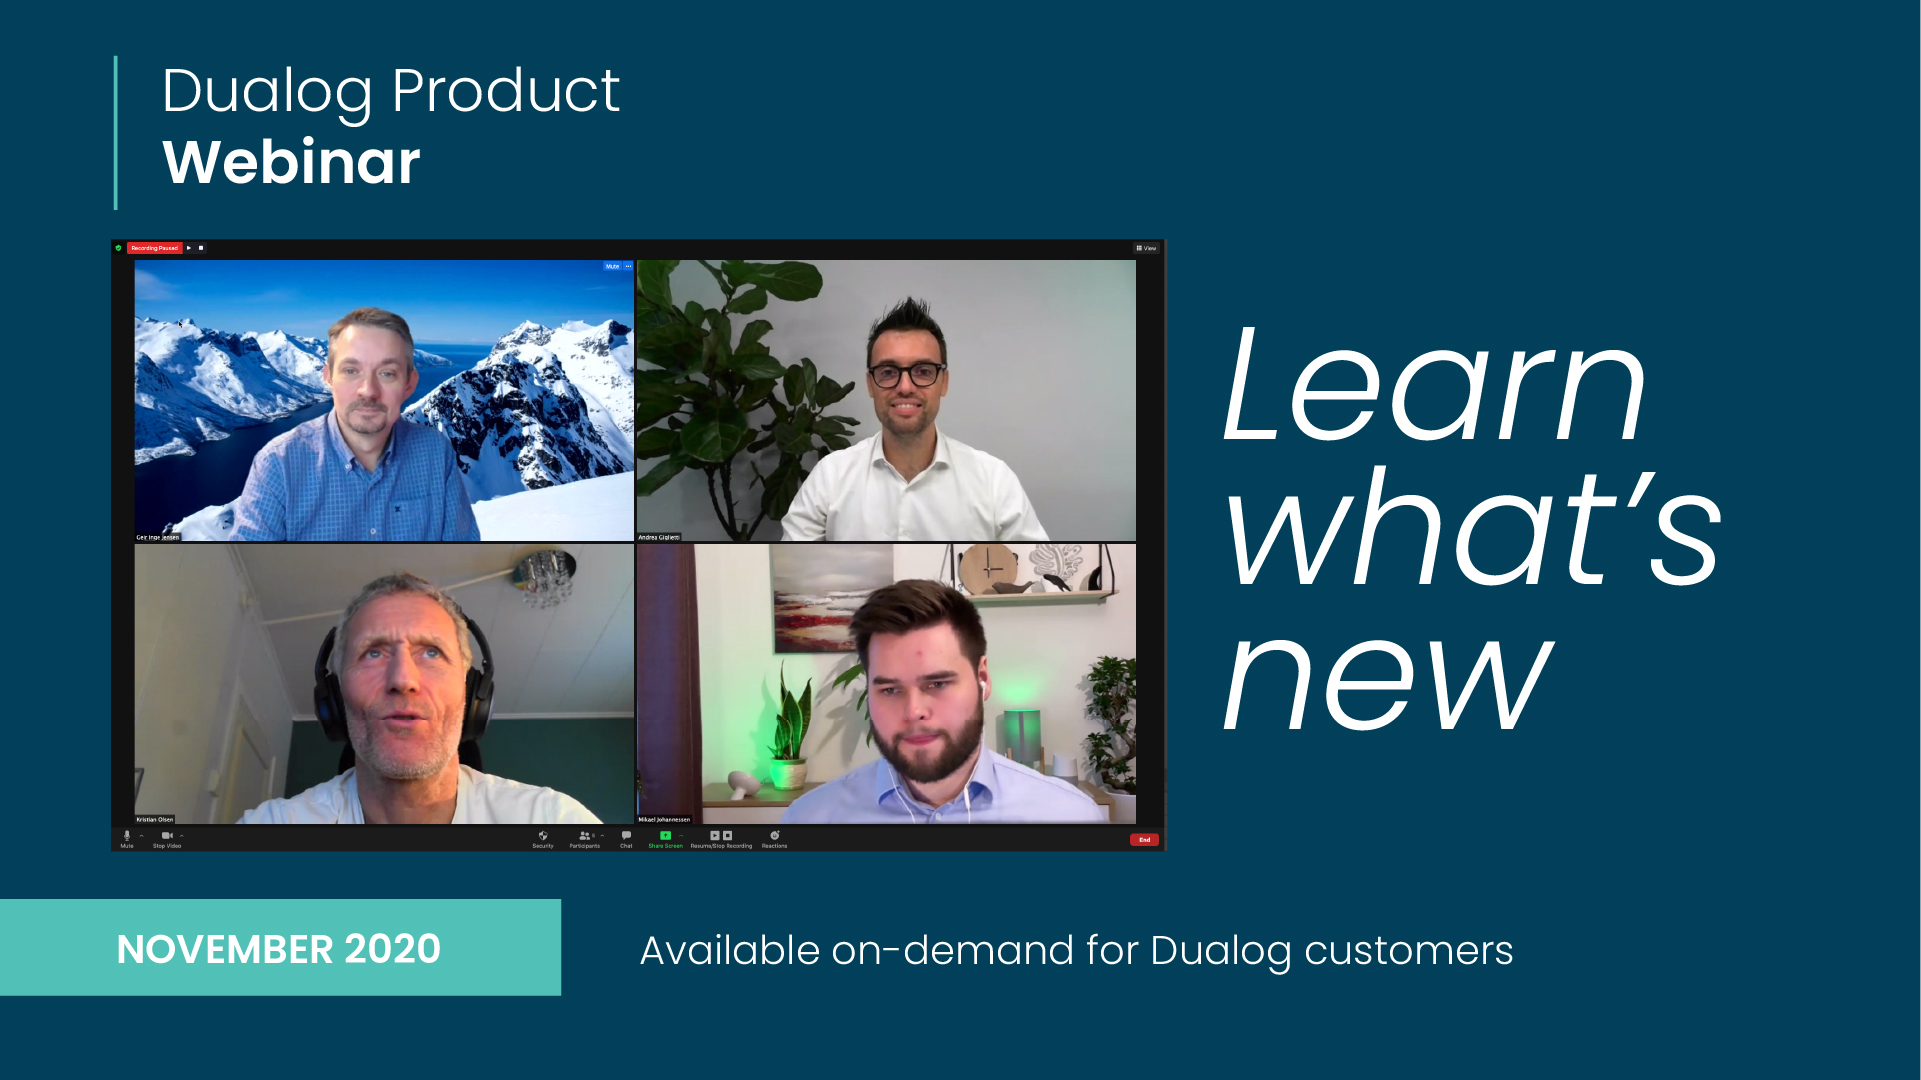 Dualog Product Webinar - November 2020